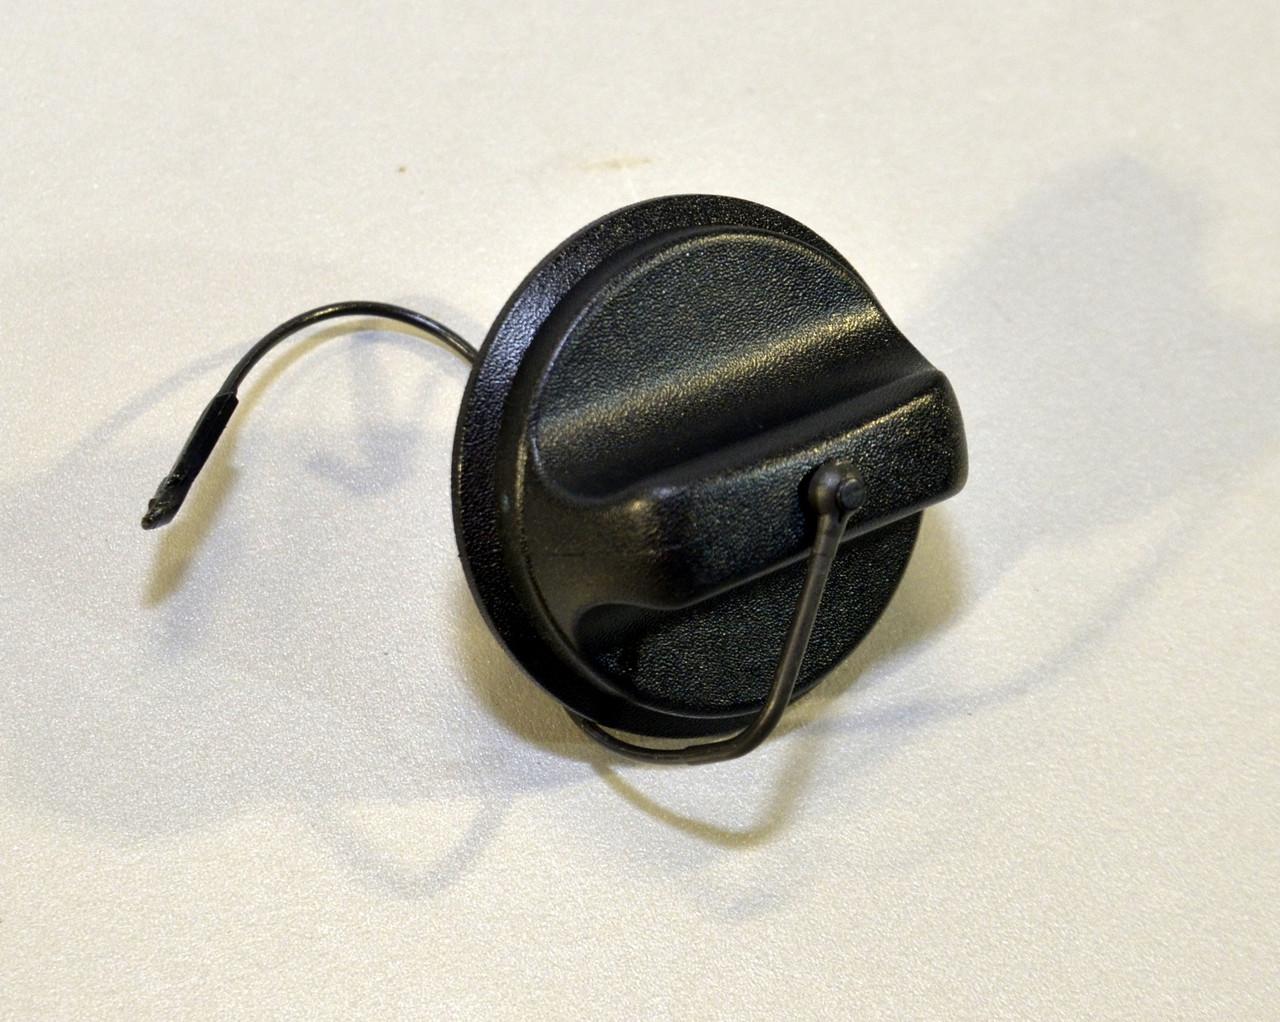 Крышка топливного бака на Renault Master III 2010-> Renault (Оригинал) - 7700431898